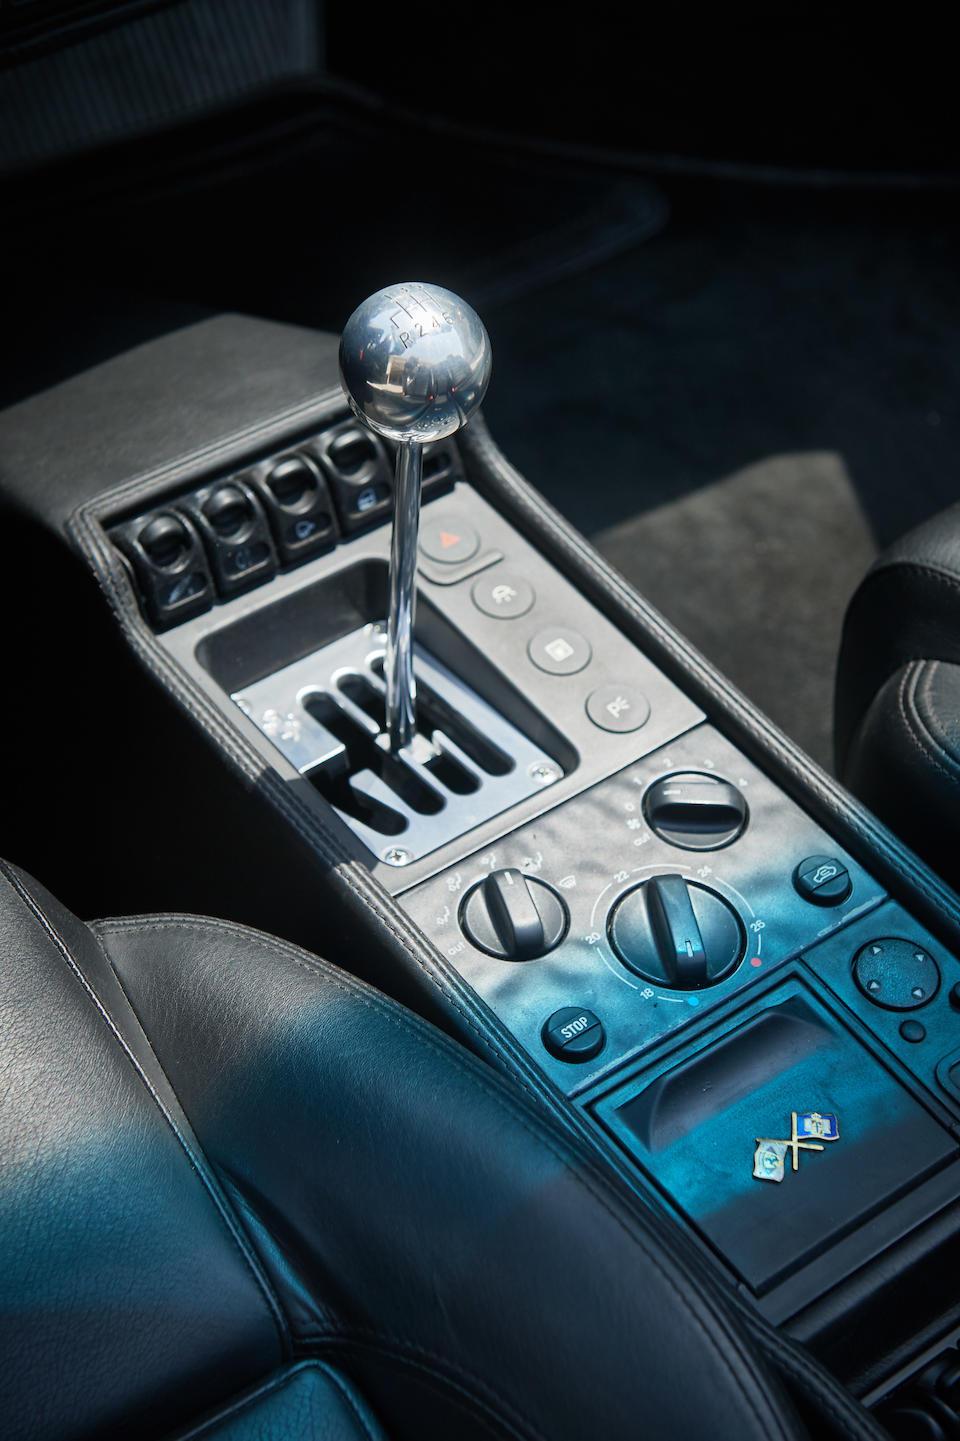 <b>1995 Ferrari F355 Spider<br />Design by Pininfarina</b><br />VIN. ZFFPR48A1S0104008